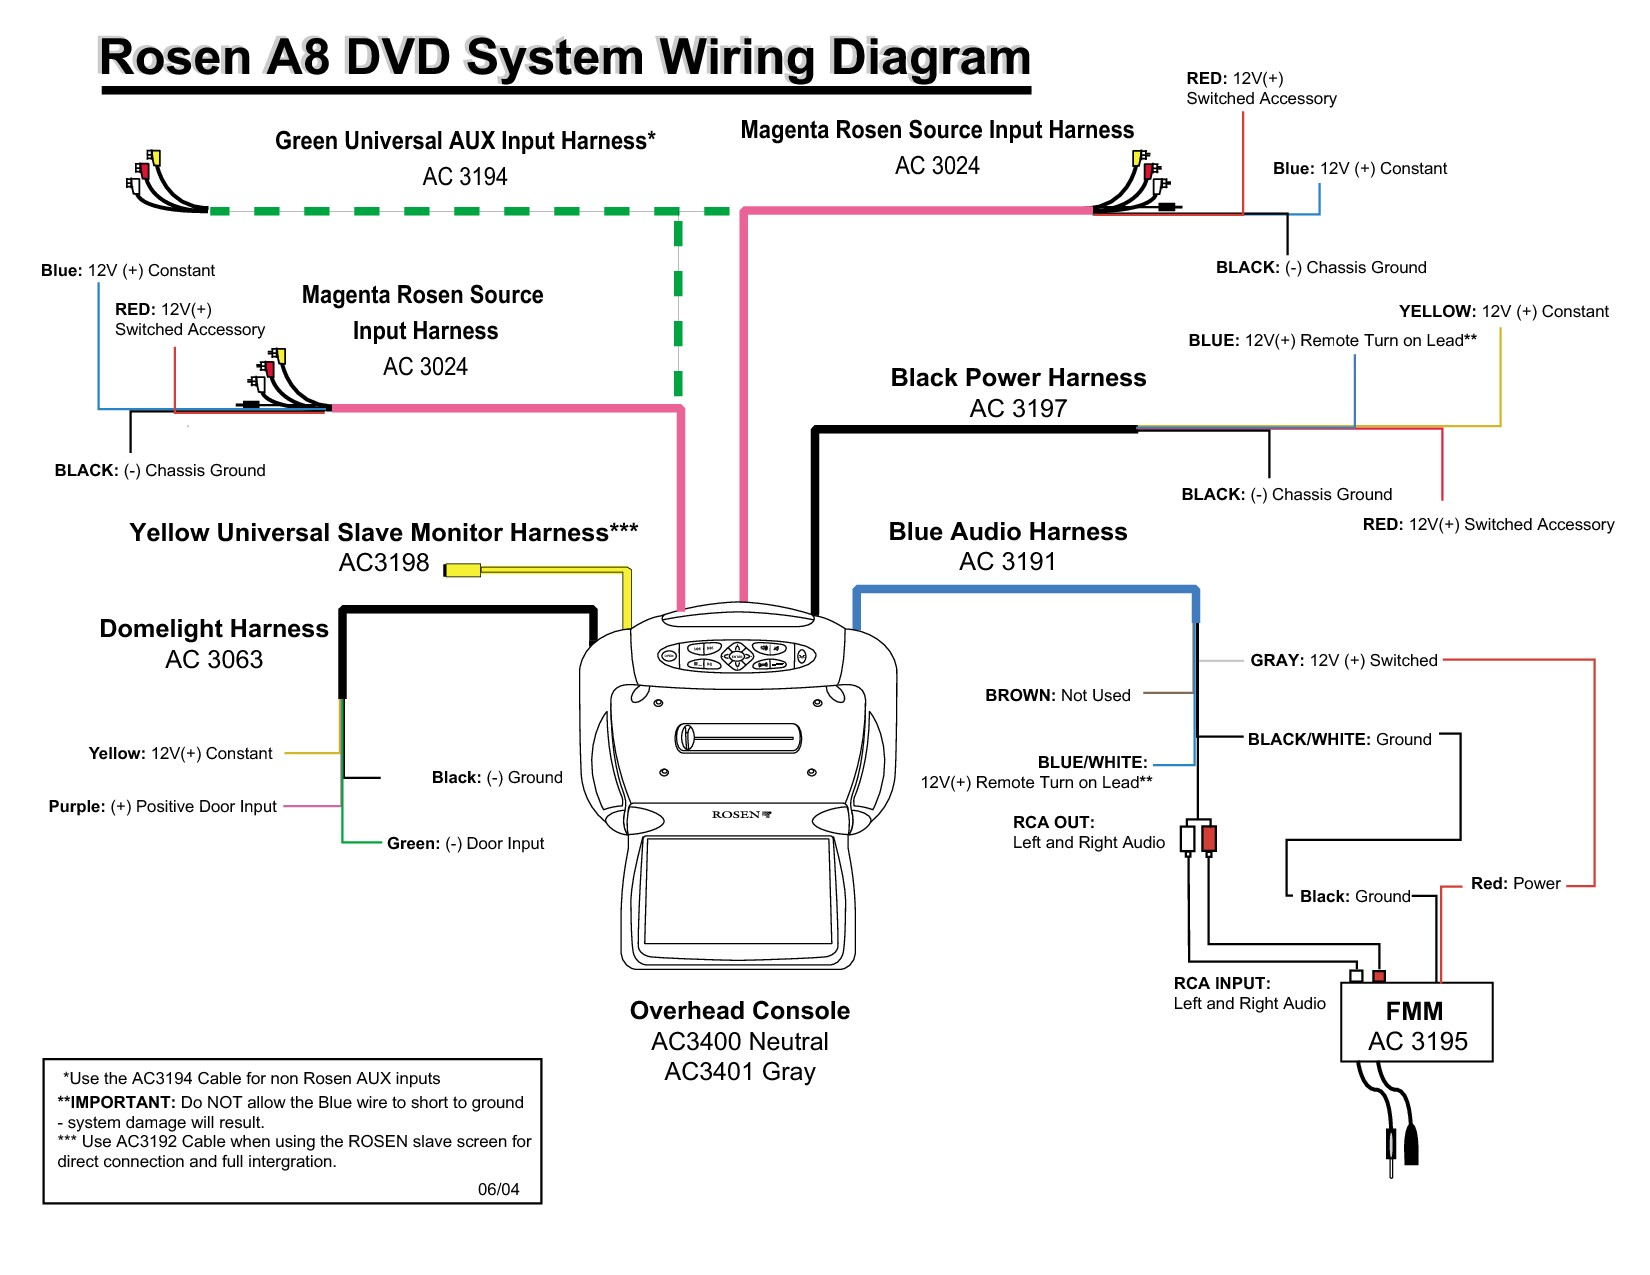 viper 5806v wiring diagram inspirational wiring diagram image rh mainetreasurechest com viper 5704 alarm wiring diagram viper 5704 alarm wiring diagram